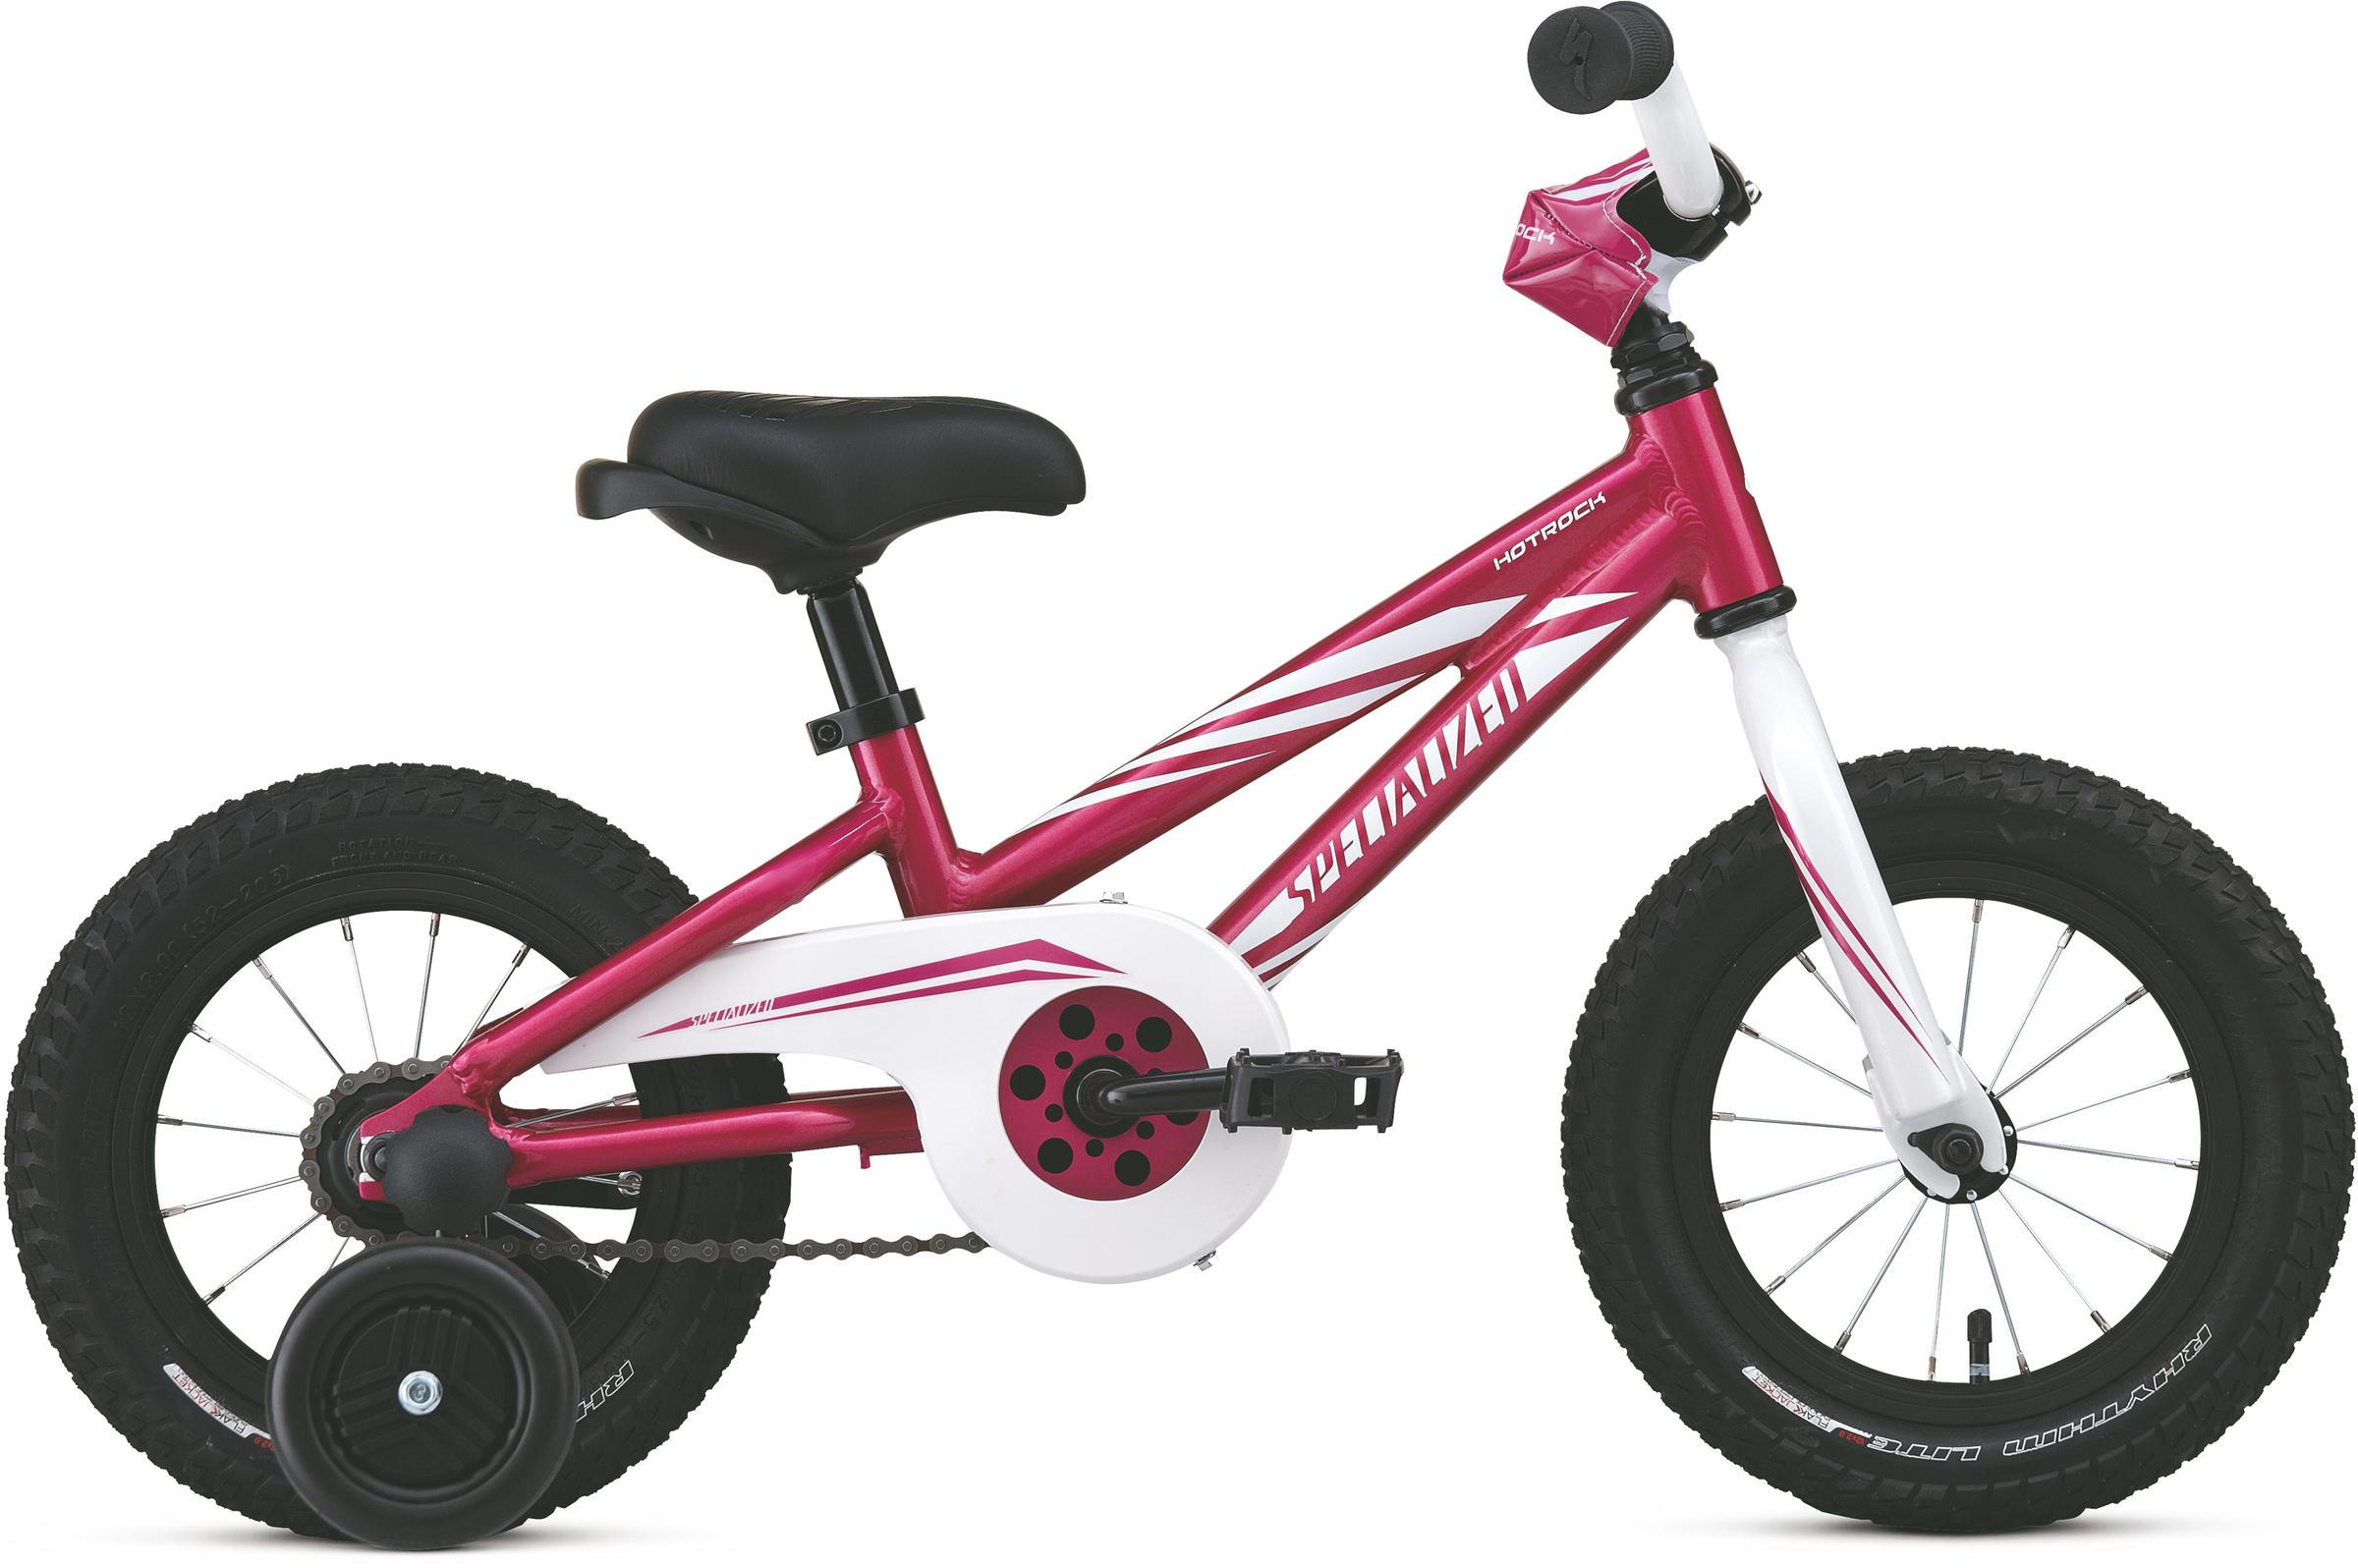 489baf6c21a Specialized Girl's Hotrock 12 Coaster - Bike Tech | Miami & Ft ...